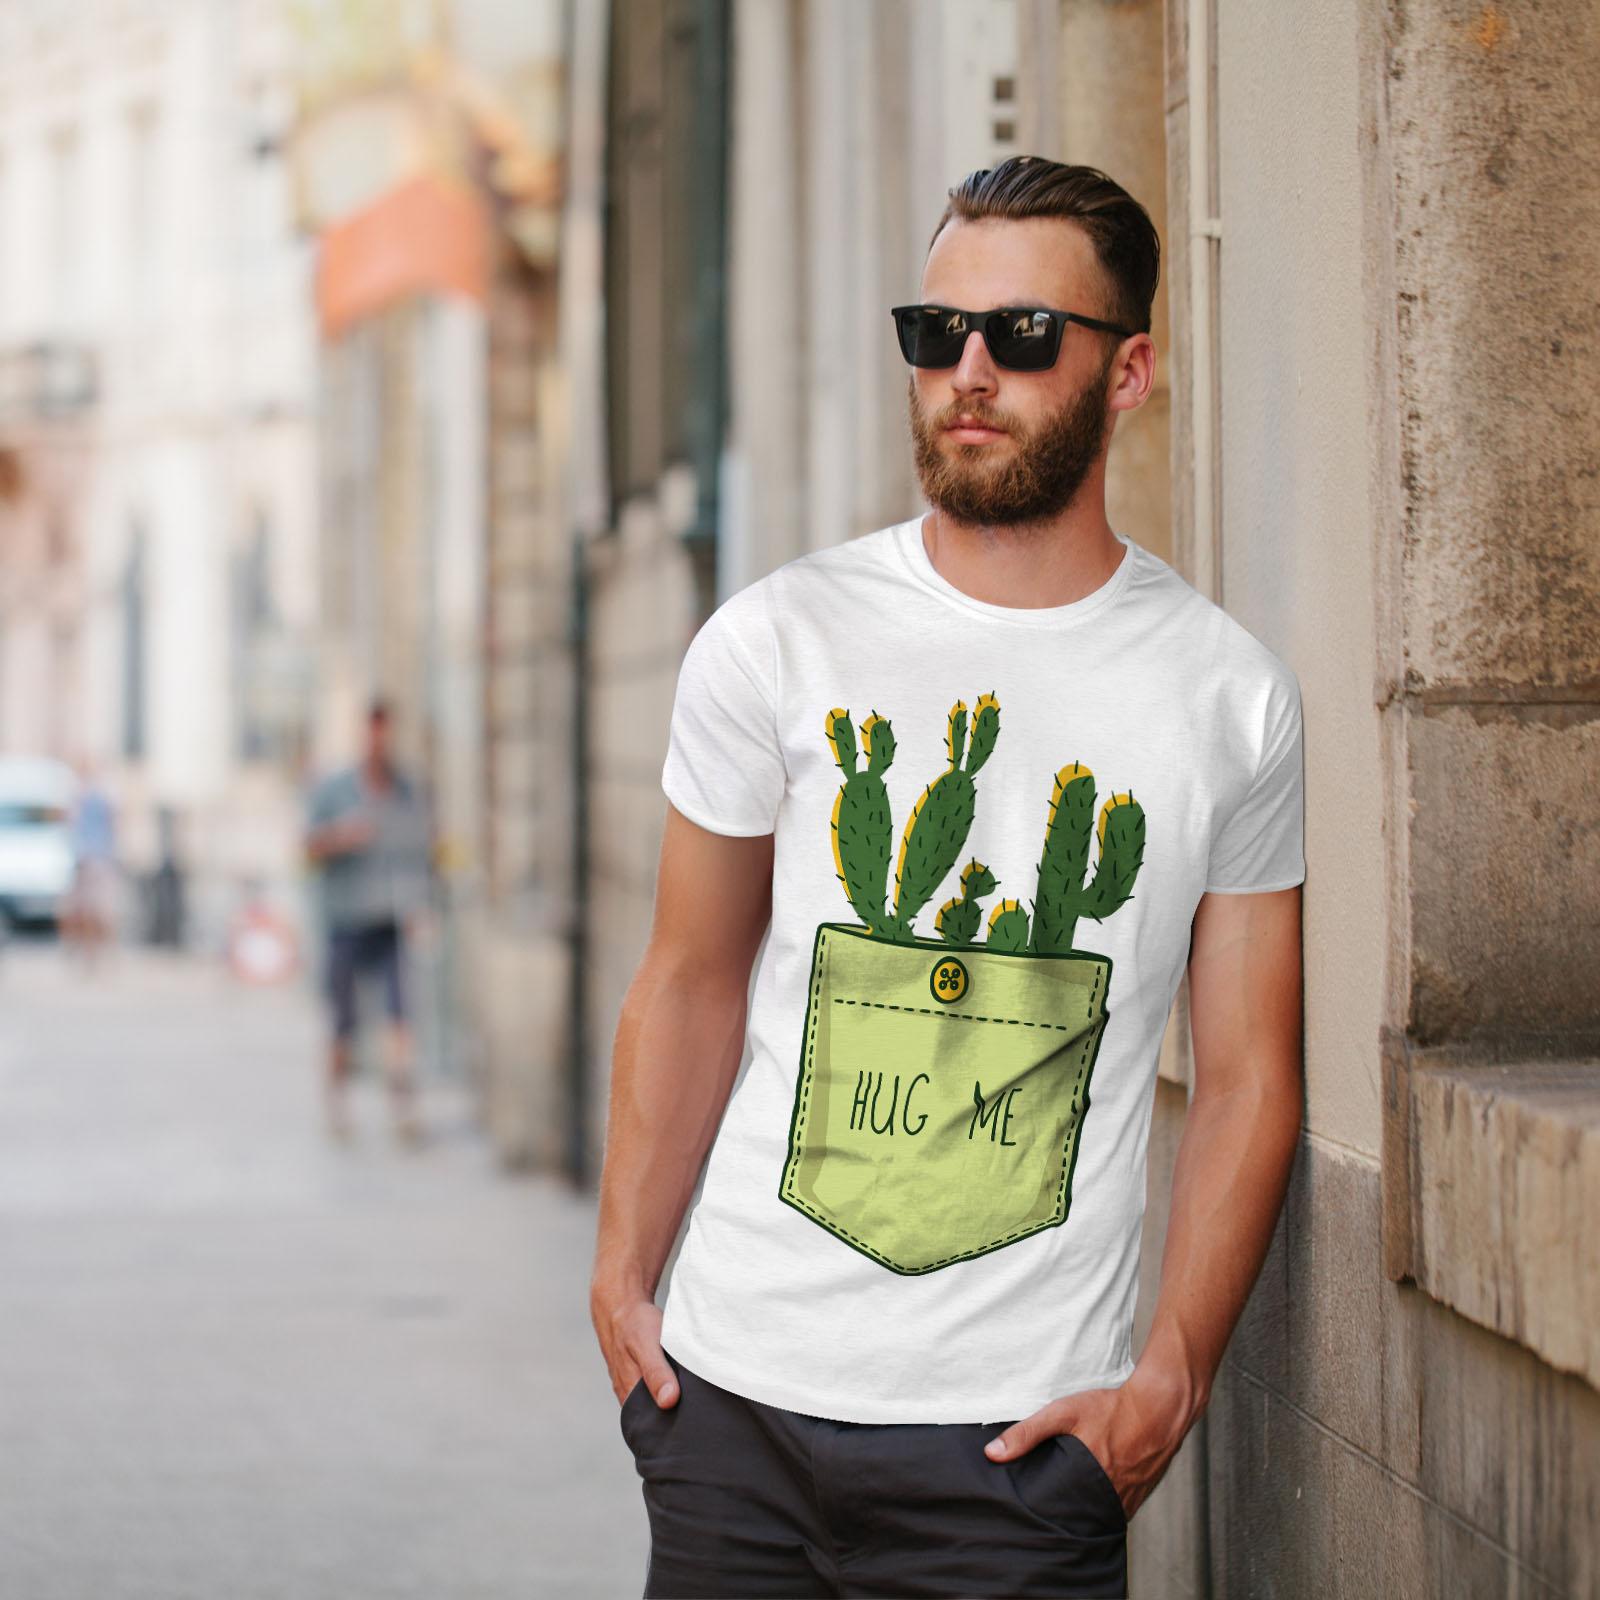 miniature 11 - Wellcoda Hug Me Cactus Funny Mens T-shirt,  Graphic Design Printed Tee